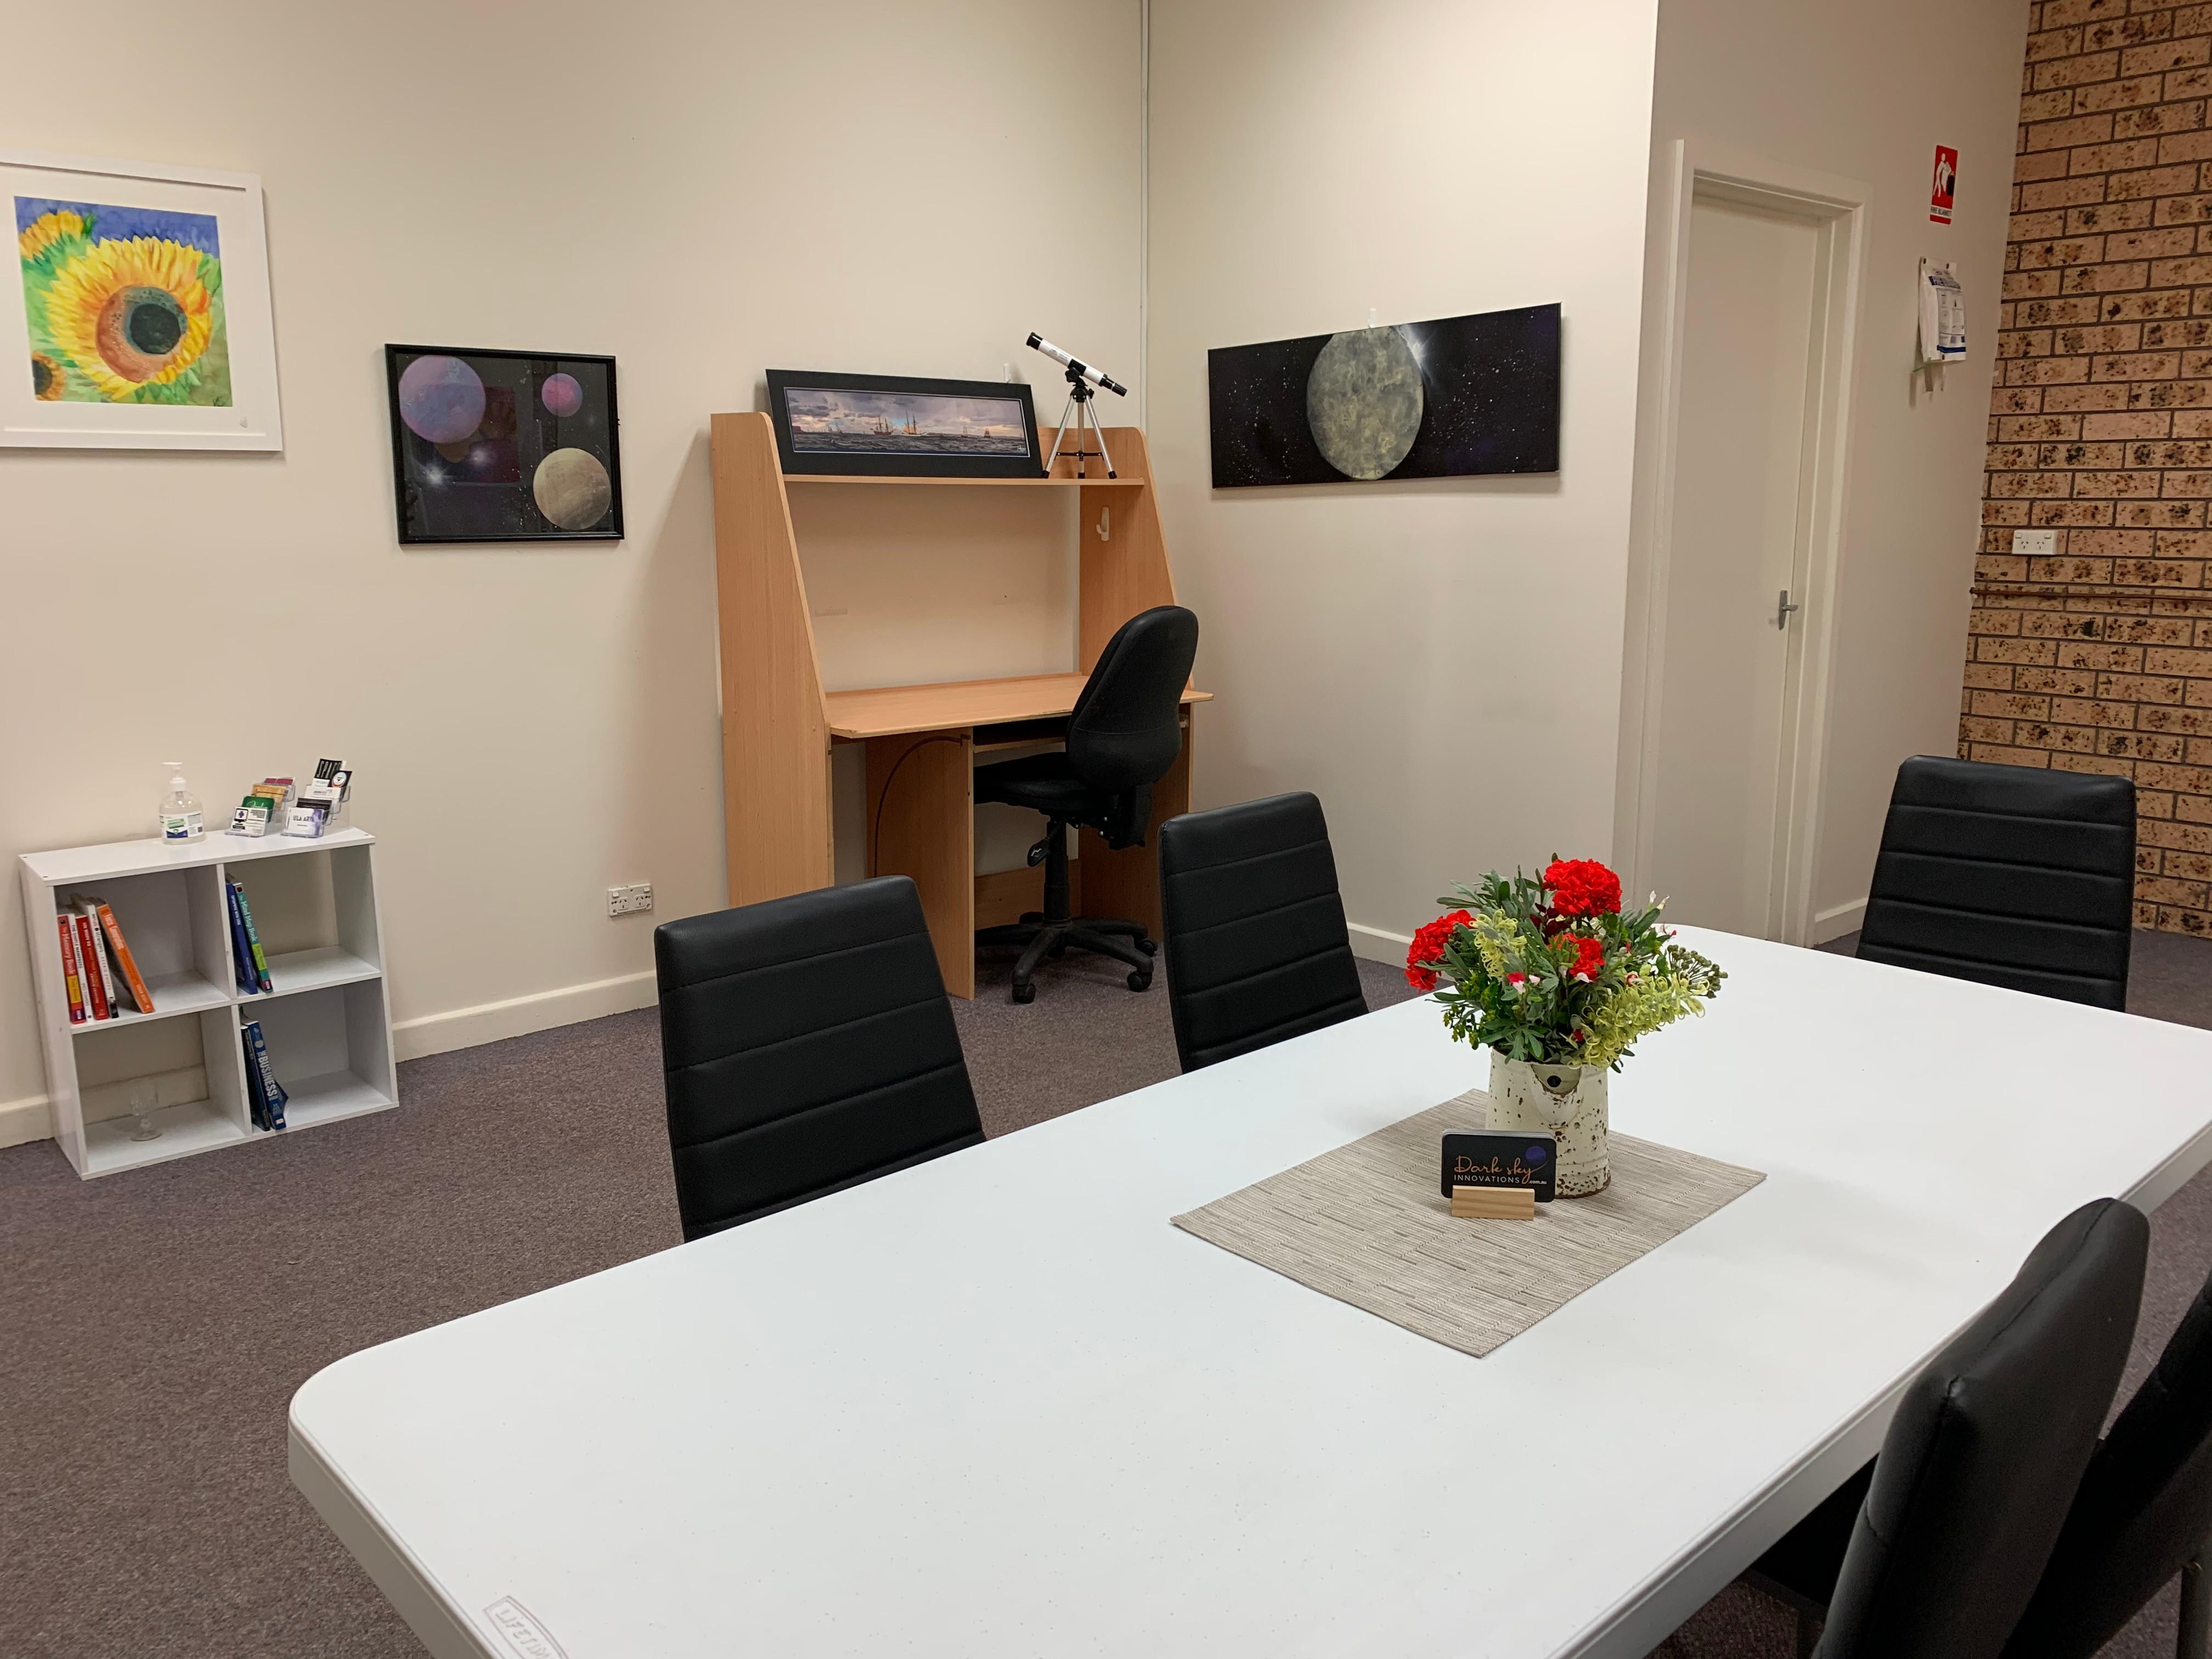 Full Day Hot Desk/Office hire